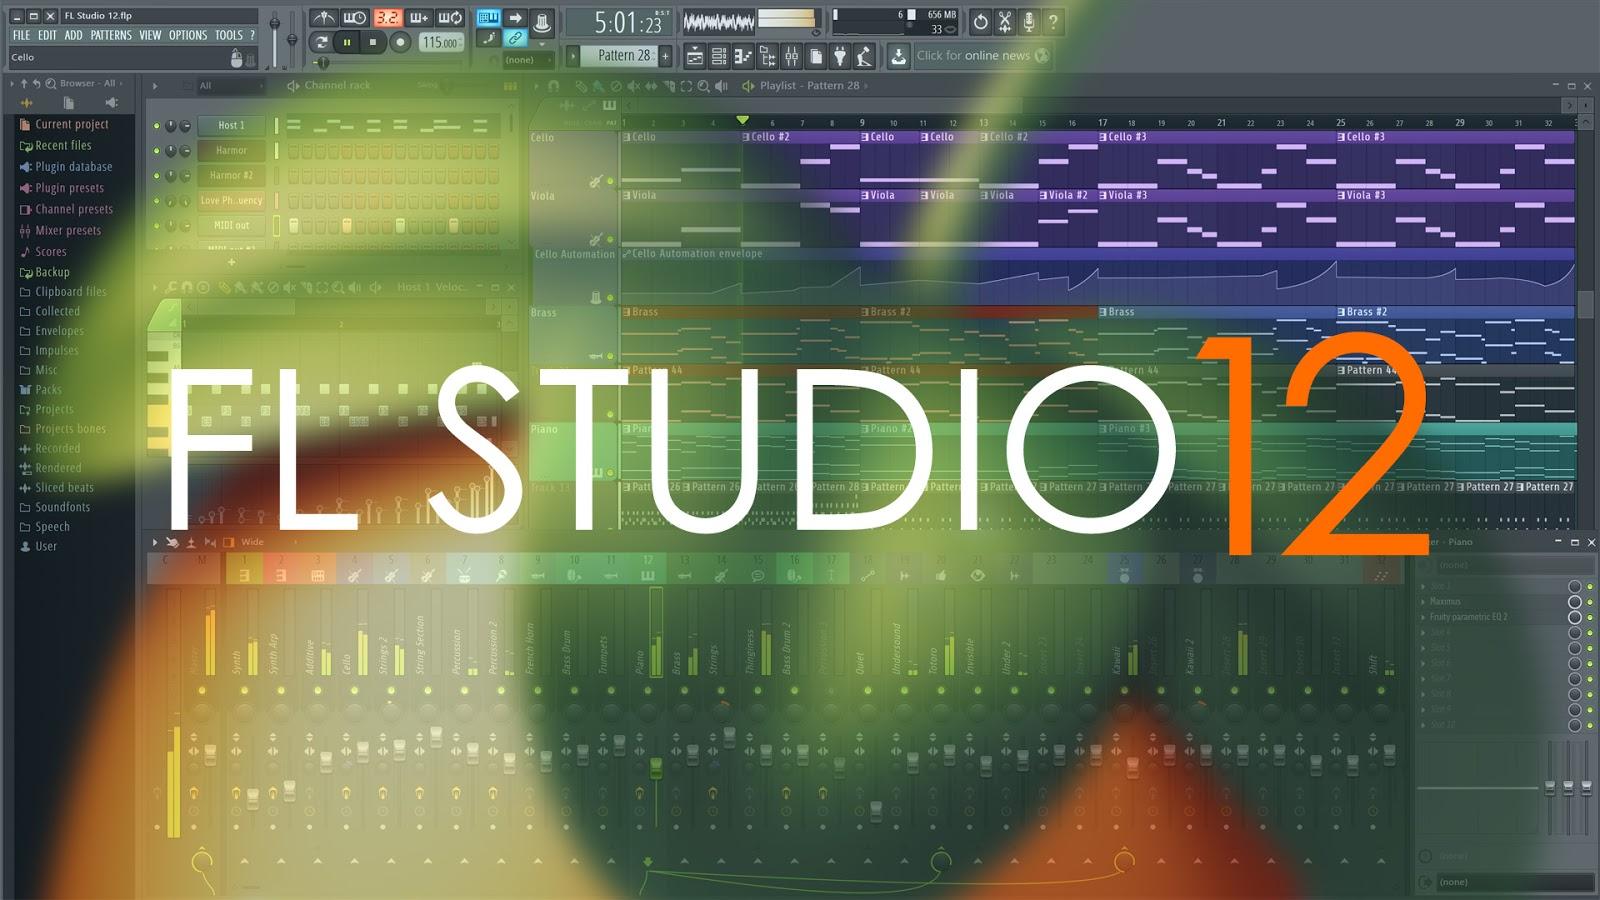 fl studio 12 3 patch